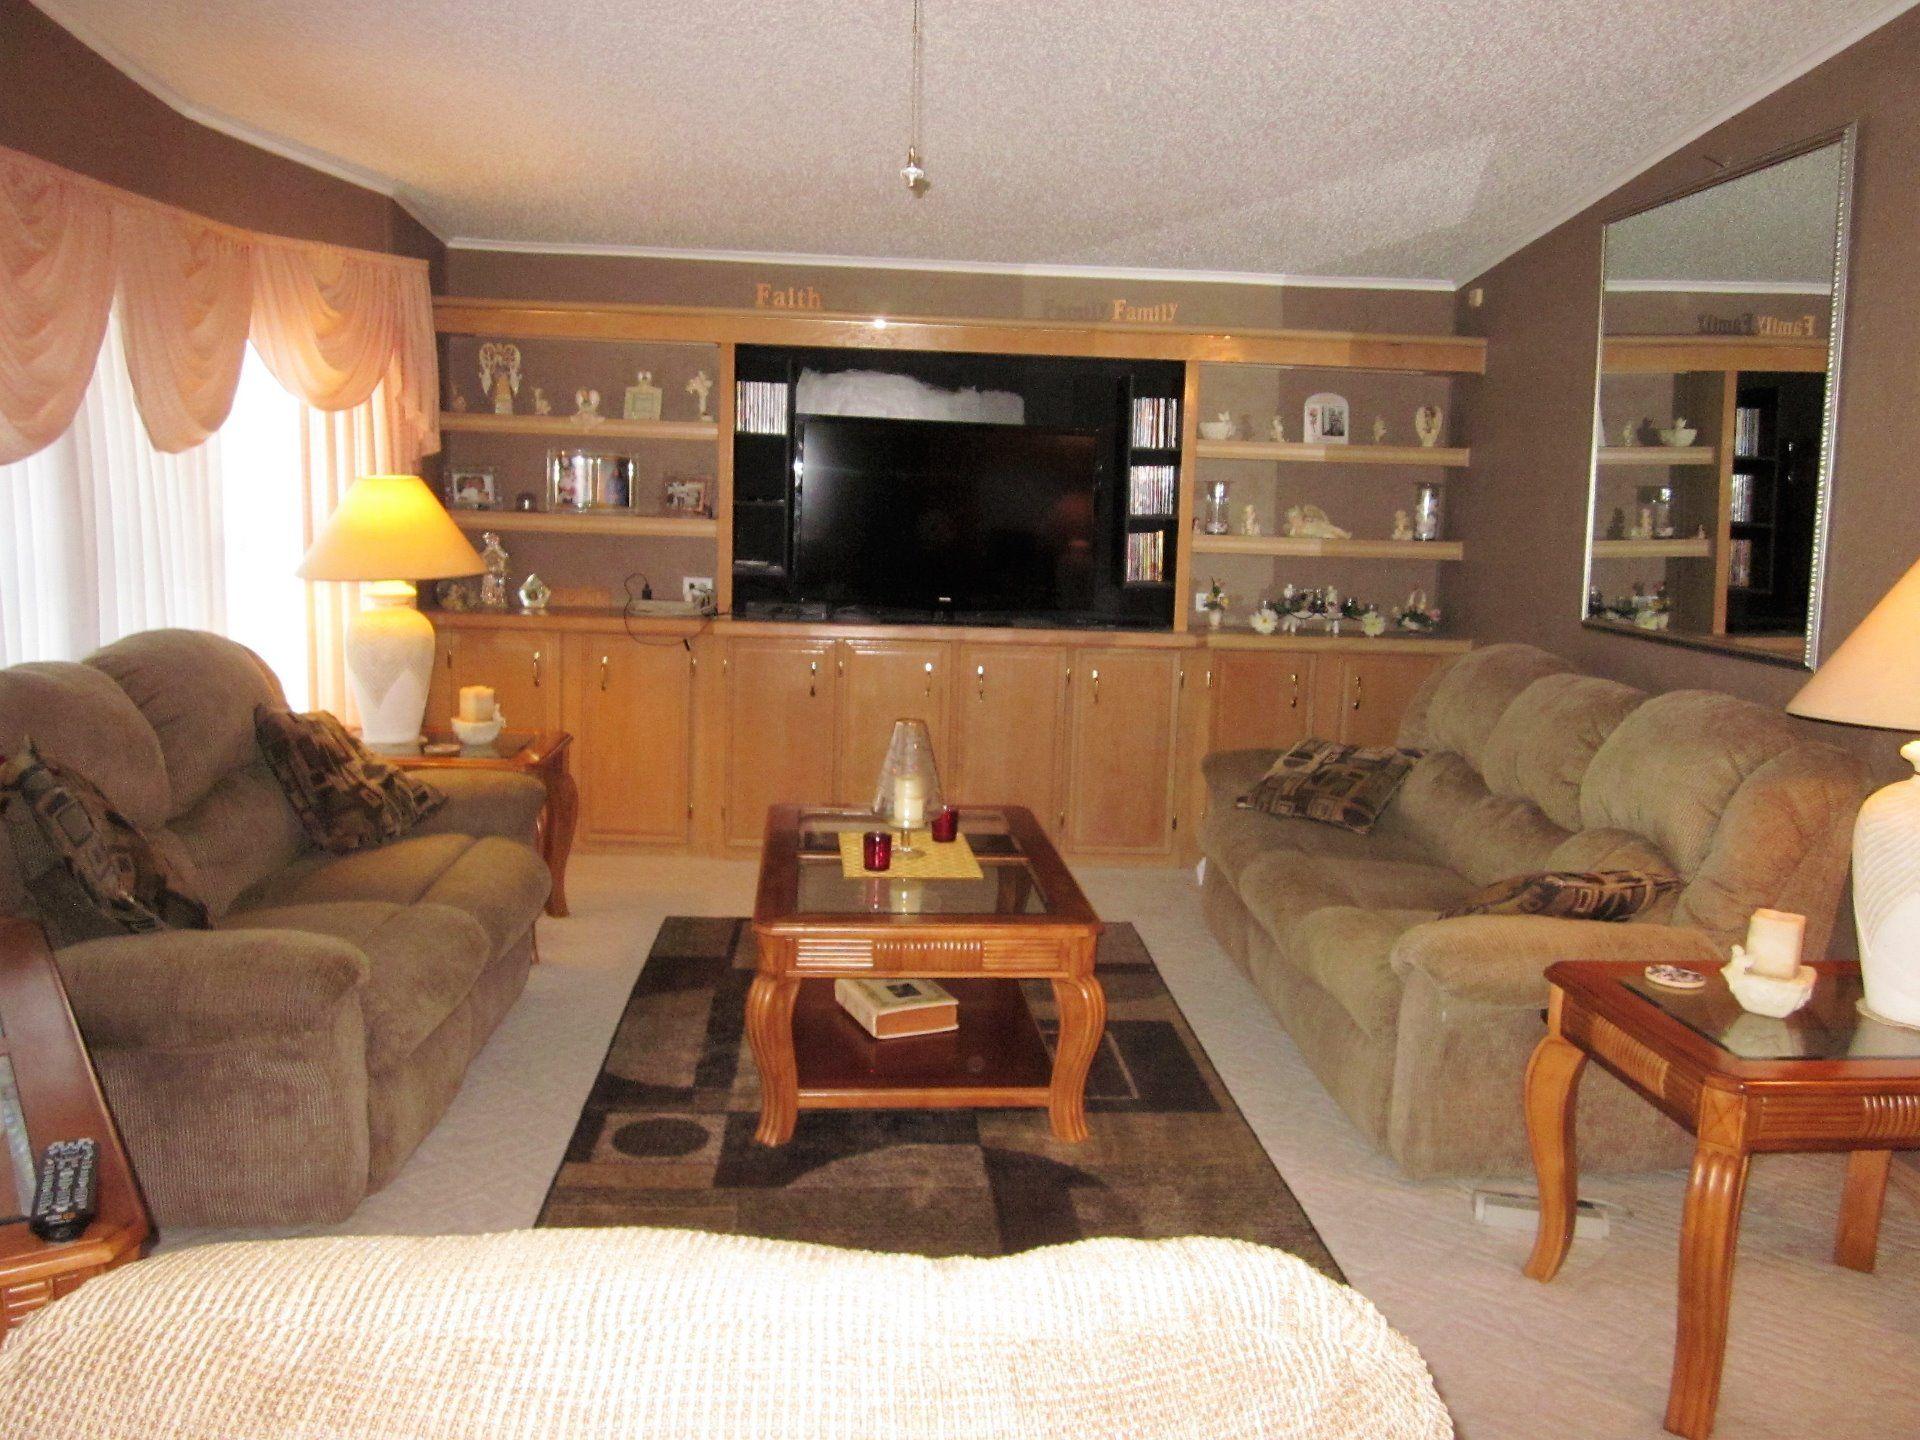 Fuqu Manufactured Home For Sale In Lakeland Fl 33801 Florida  # Muebles Lakeland Fl